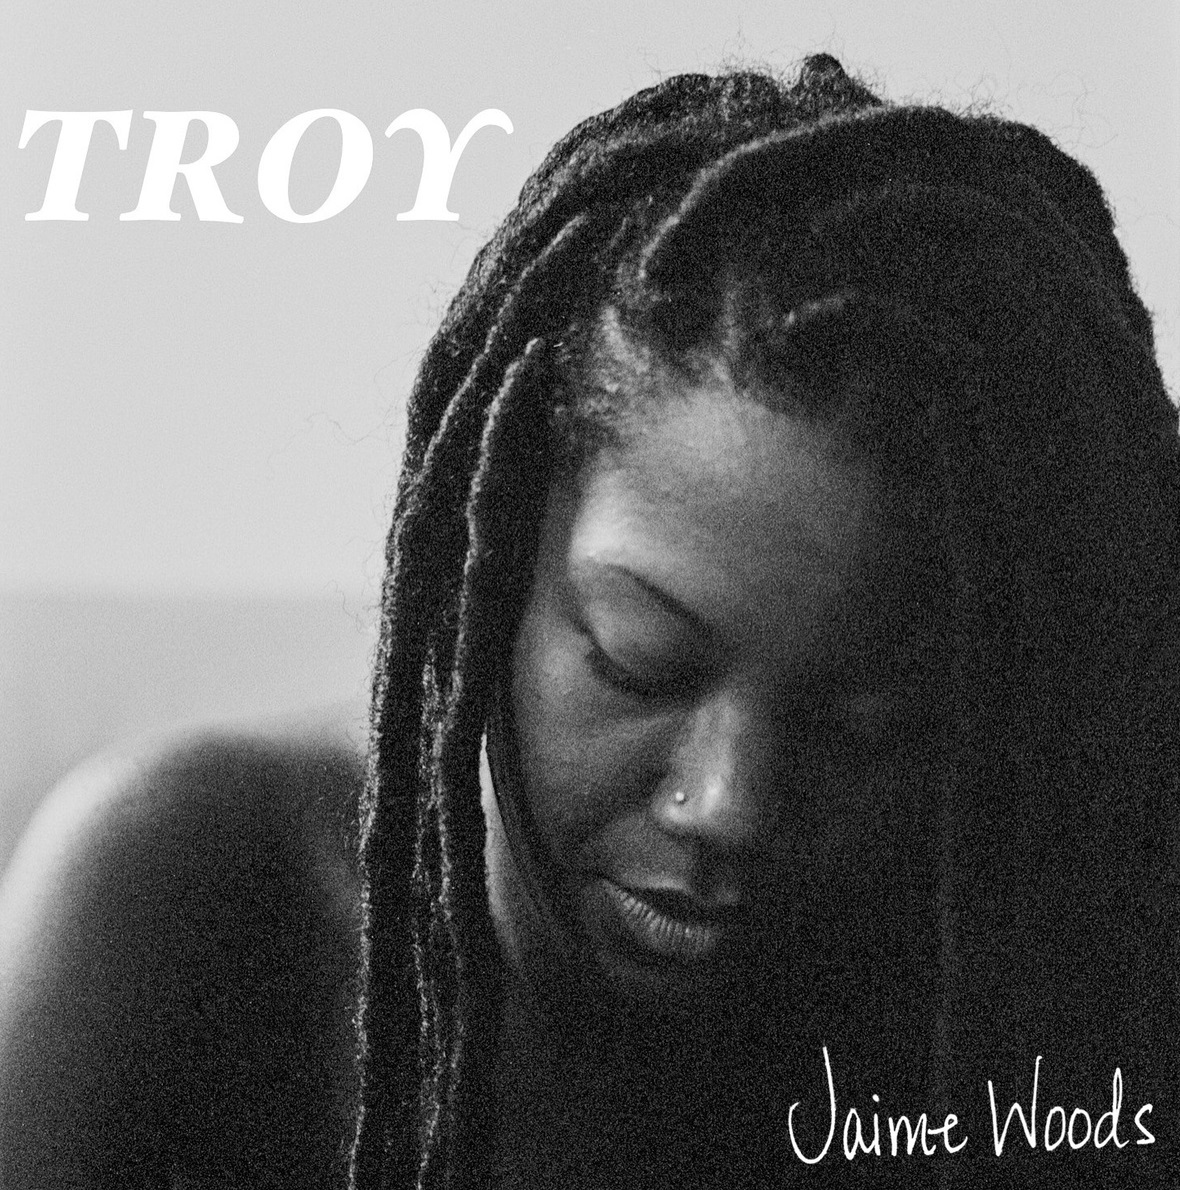 Jaime Woods - TROY